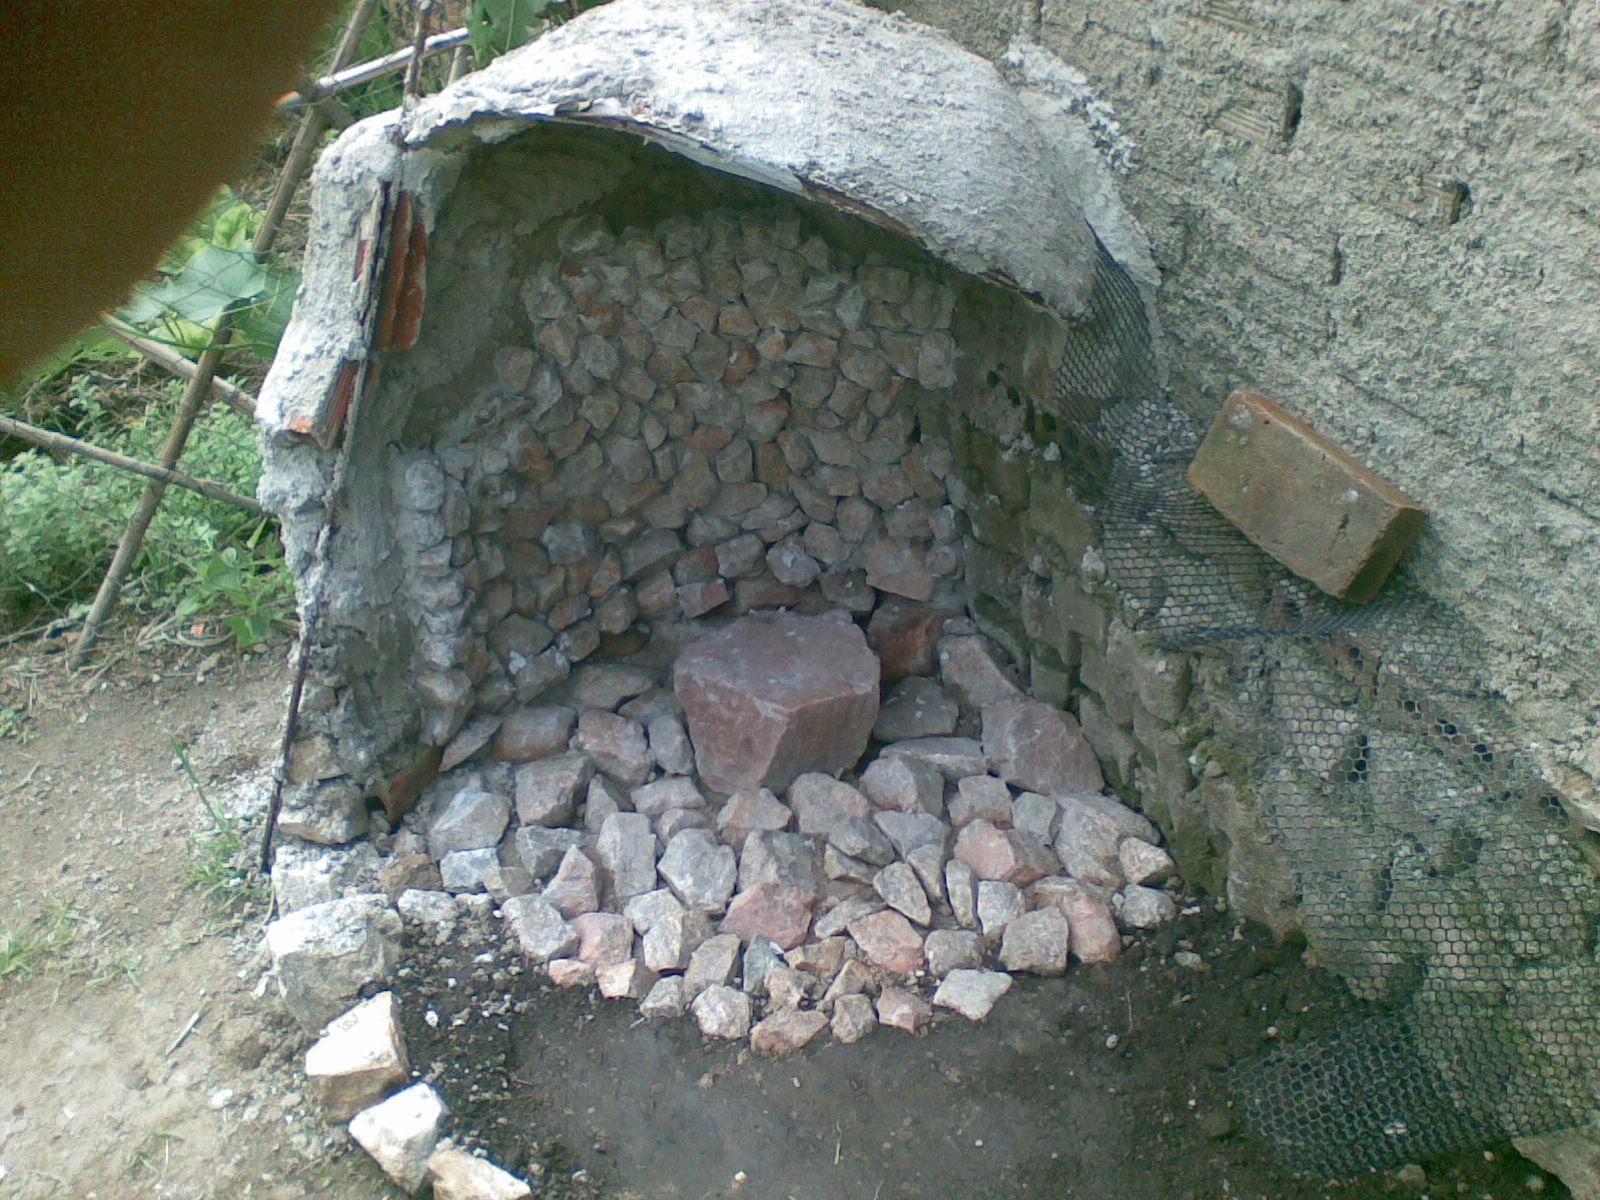 gruta de pedra para jardim : gruta de pedra para jardim:PERMACULTURA URBANA. MODELO DE GRUTA DE JARDIM